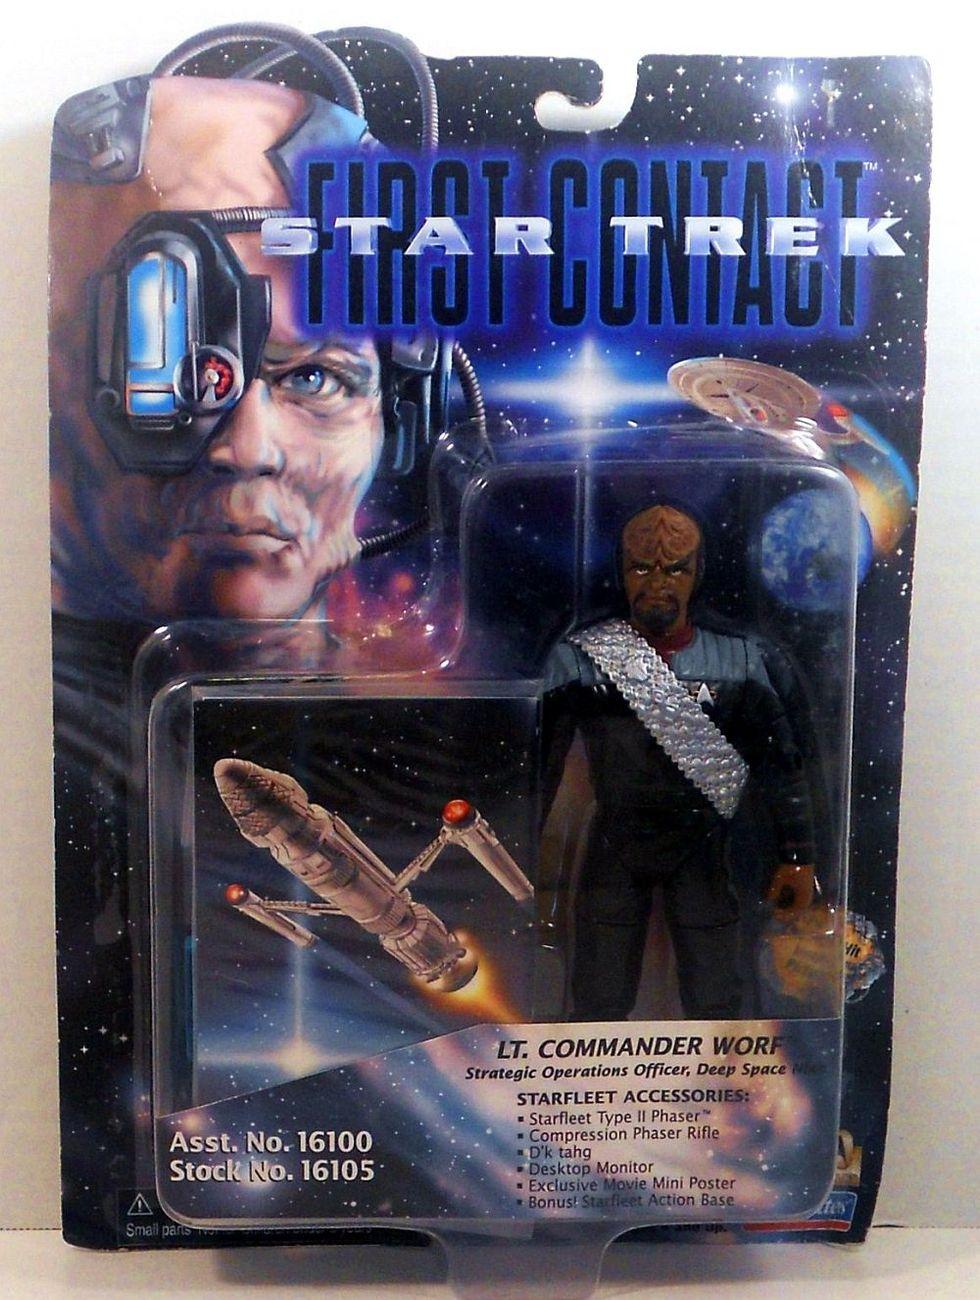 Star Trek First Contact Lt Commander Worf Playmates 1996